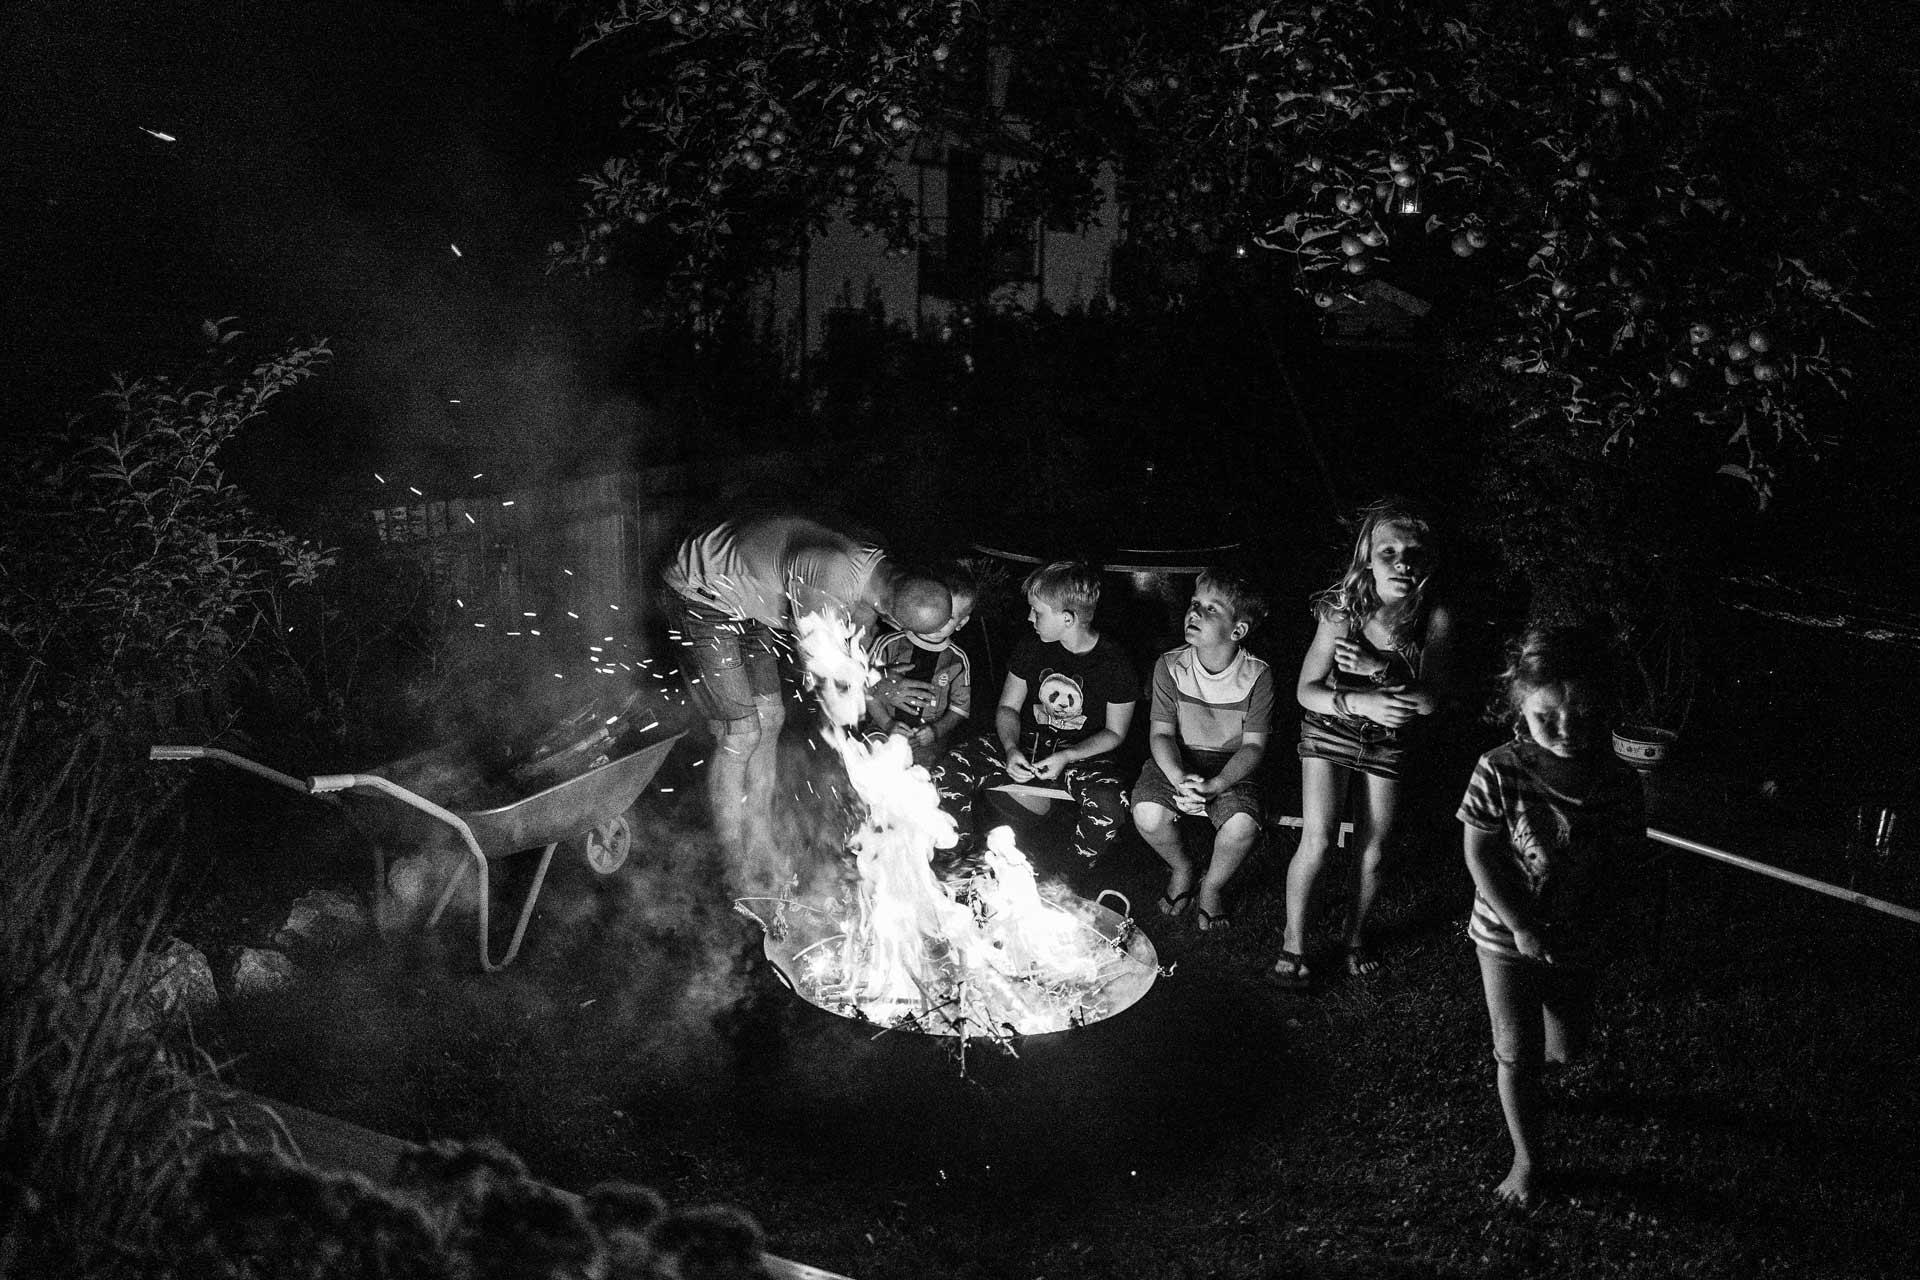 Familienfotos am Lagerfeuer